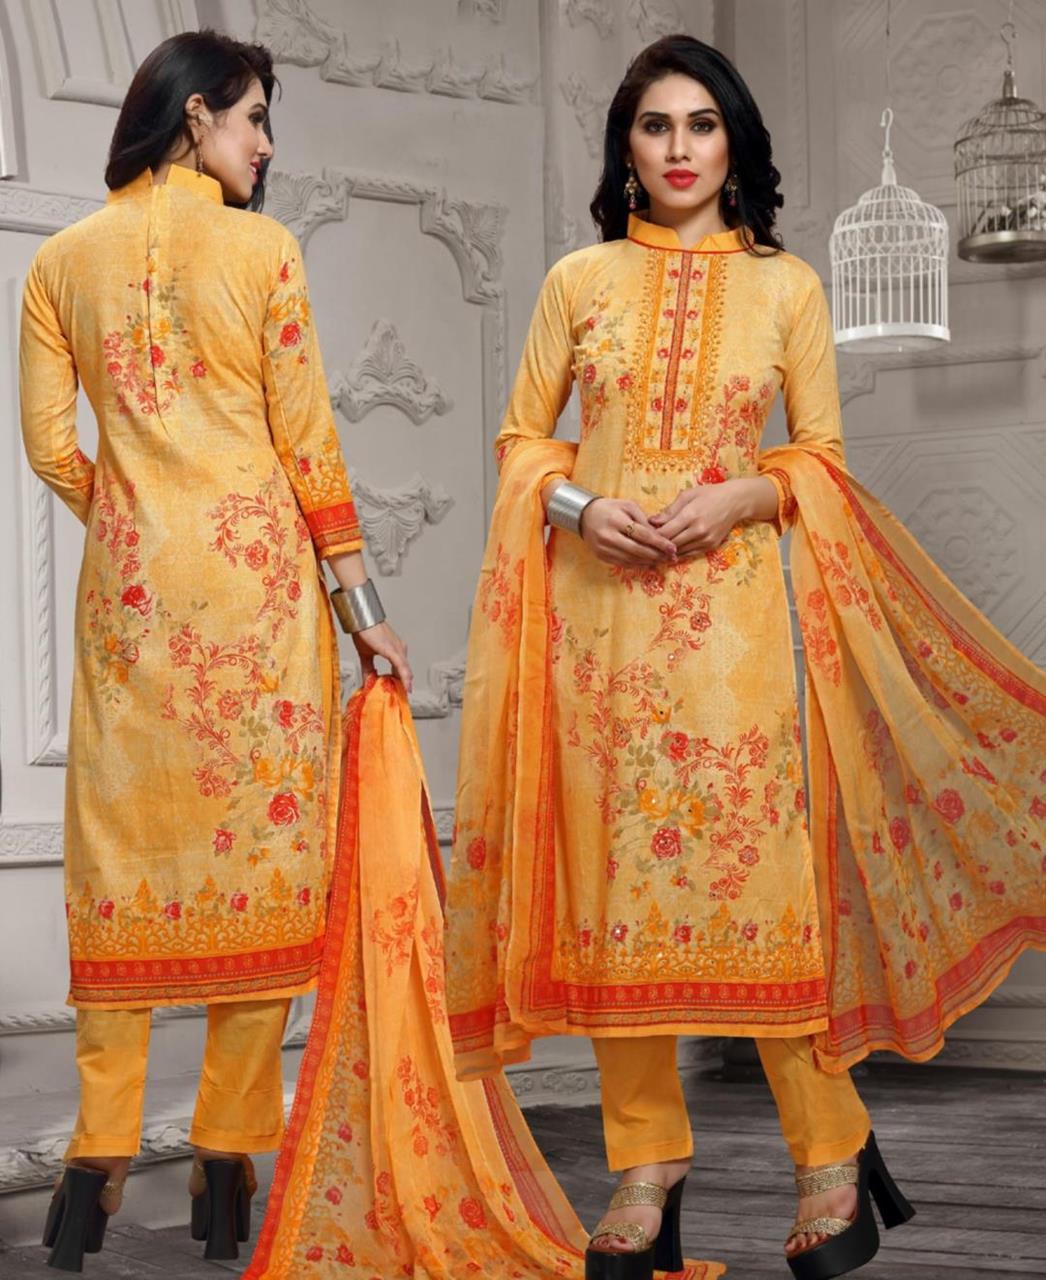 Printed Cotton Yellow Straight Cut Salwar